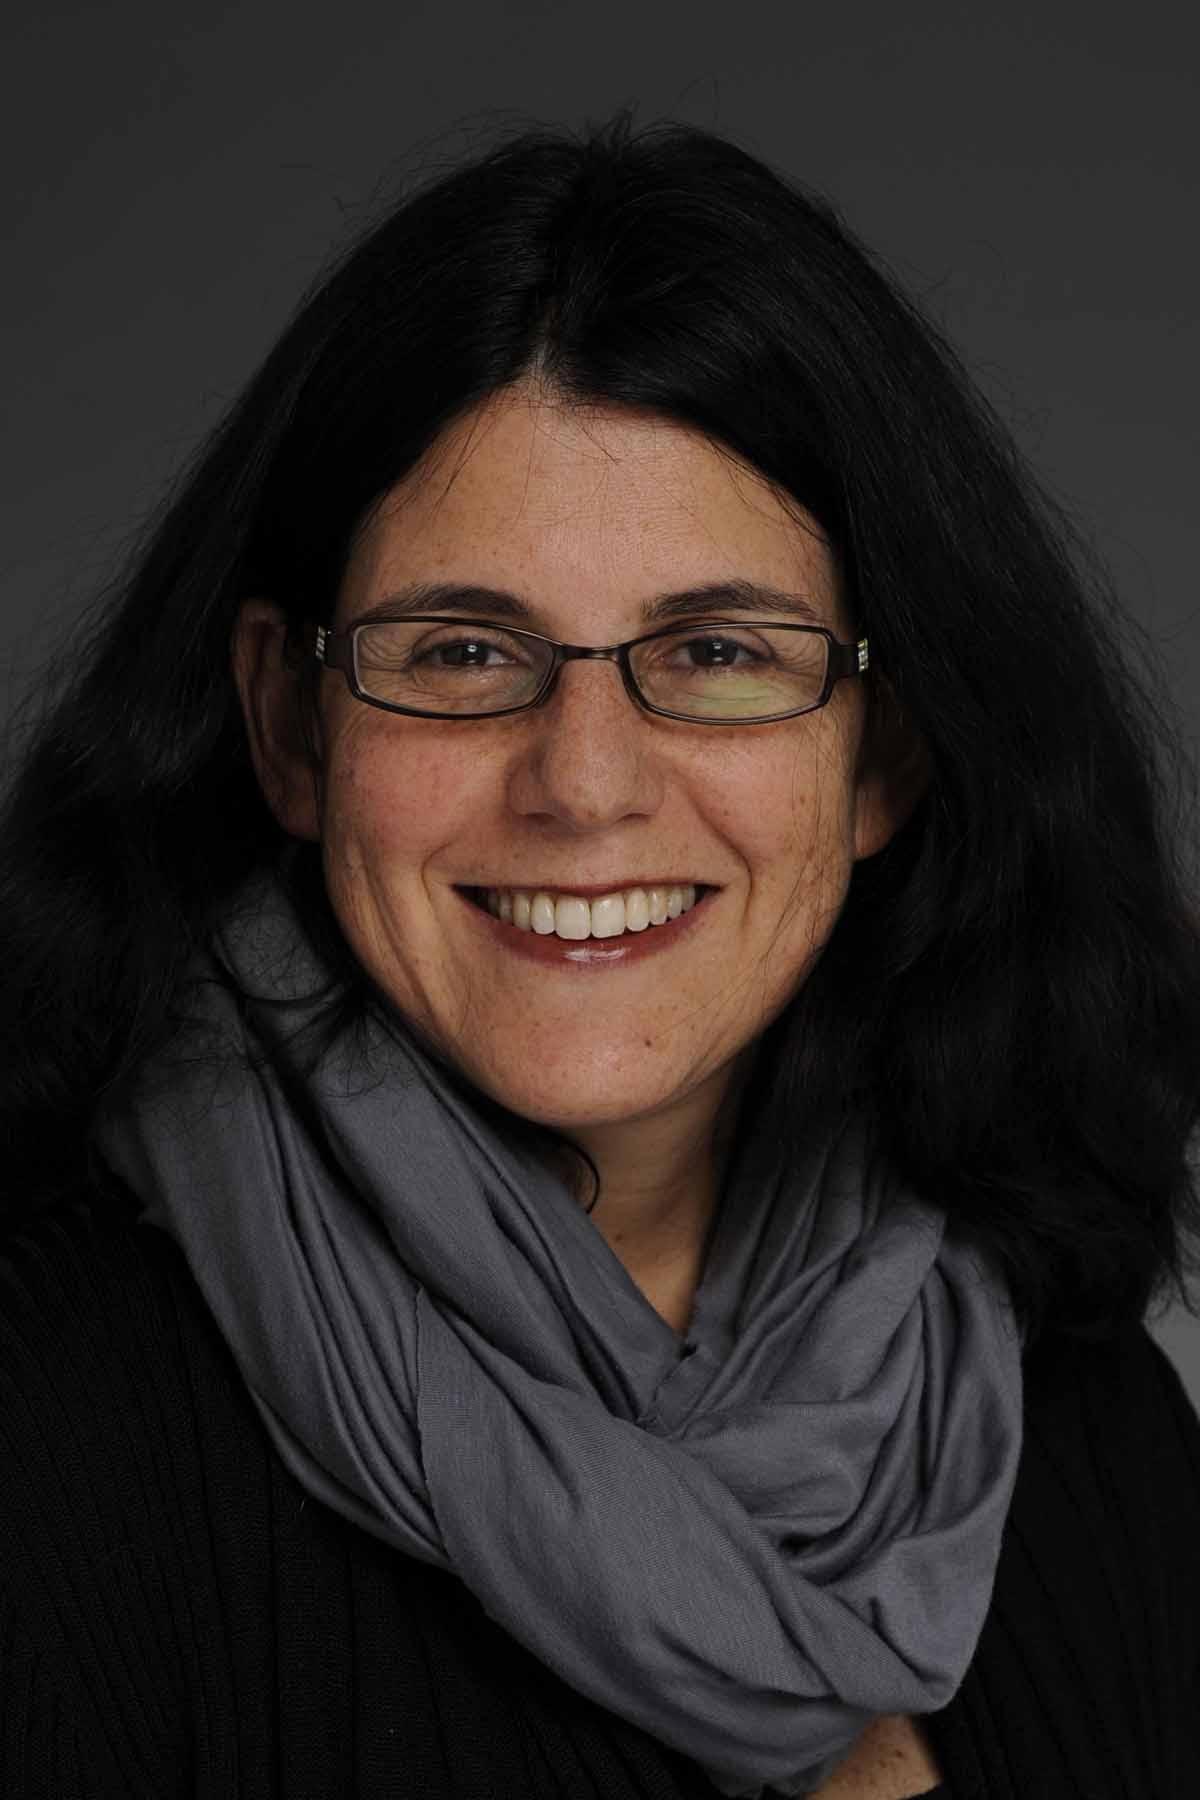 Dr. Andrea Levinson